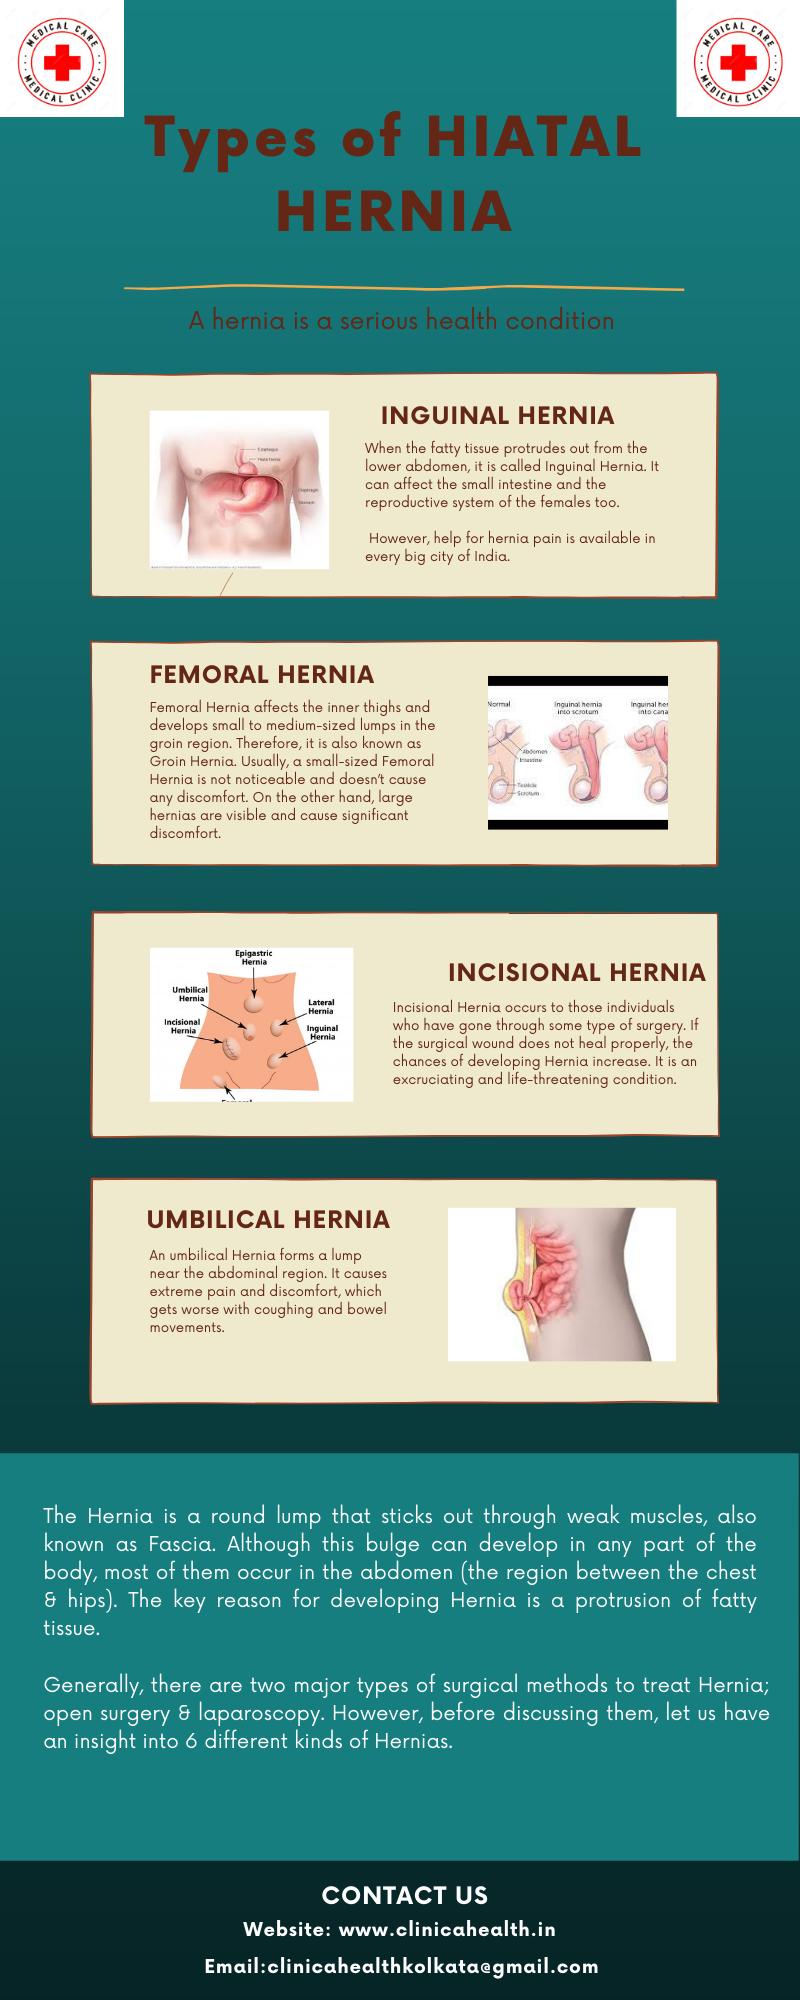 Types of Hiatal Hernia – Clinica Health